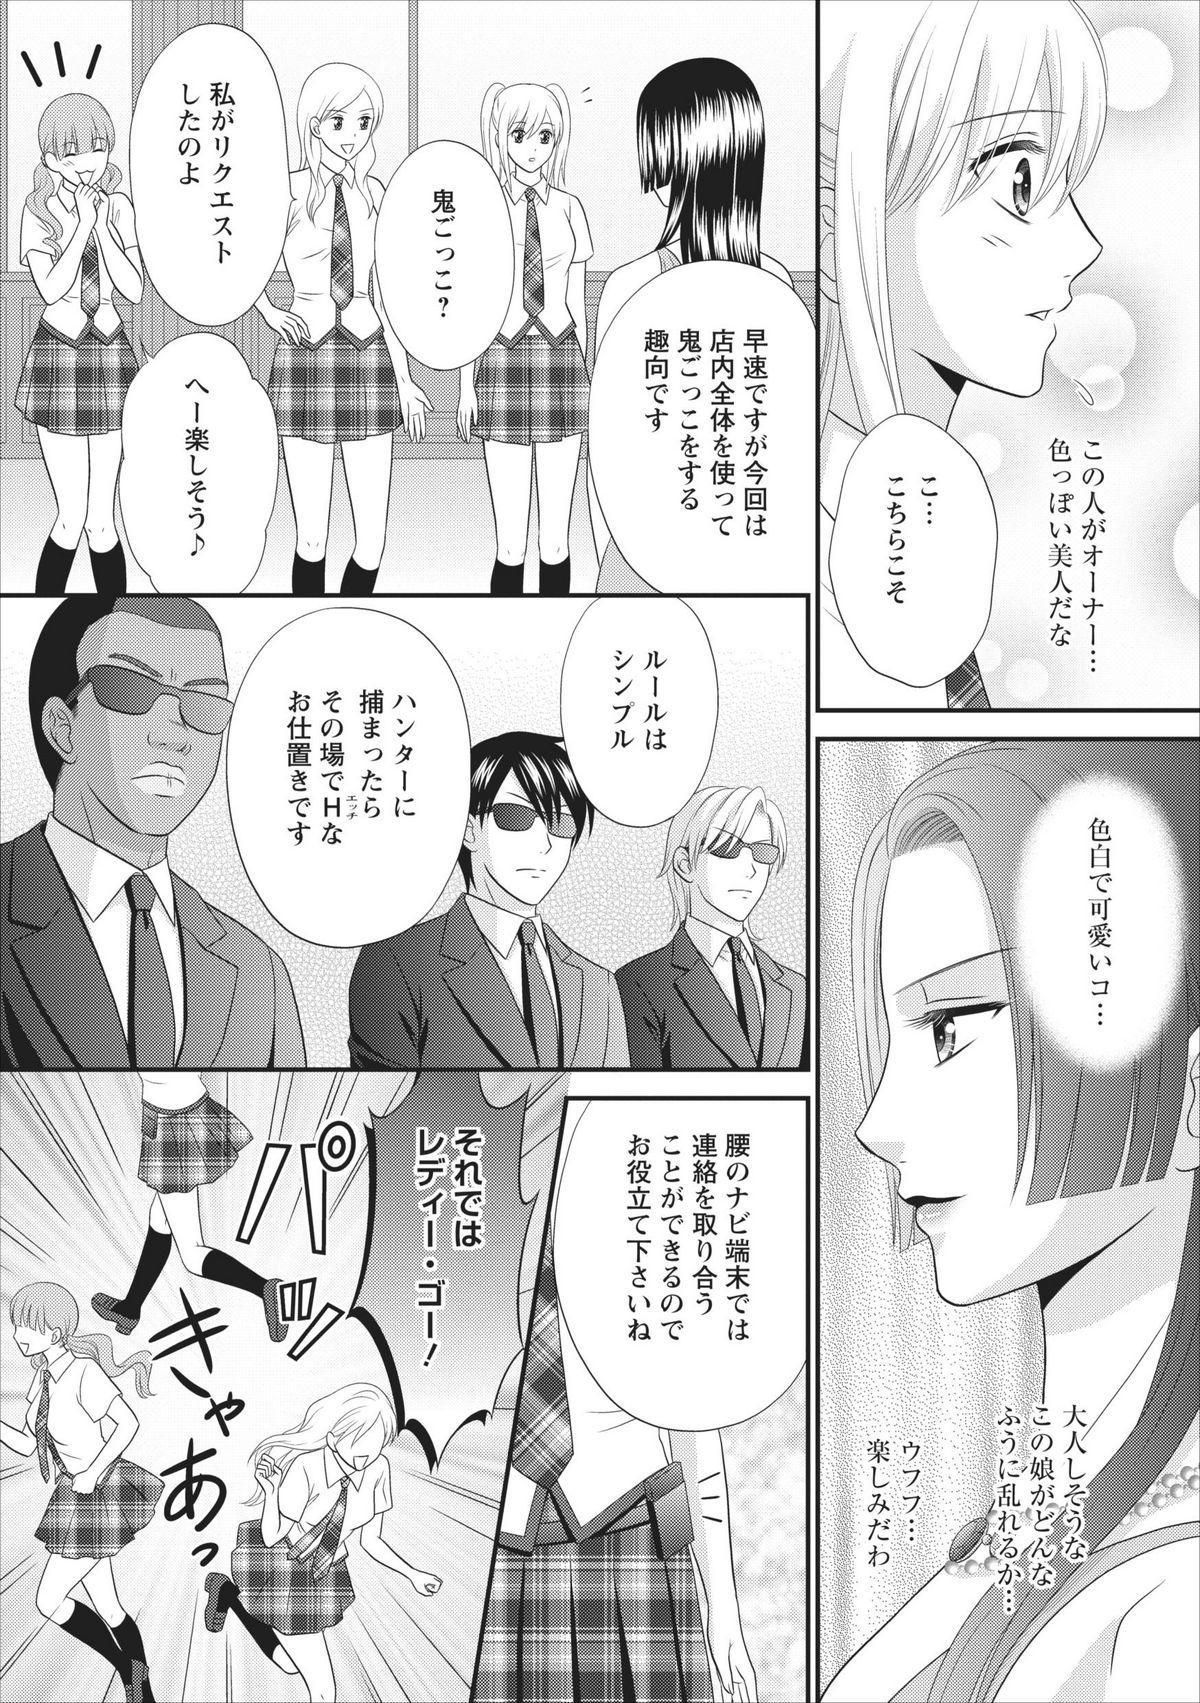 Himitsu Club Himiko - Inwai Kan no Joou ch.2 5